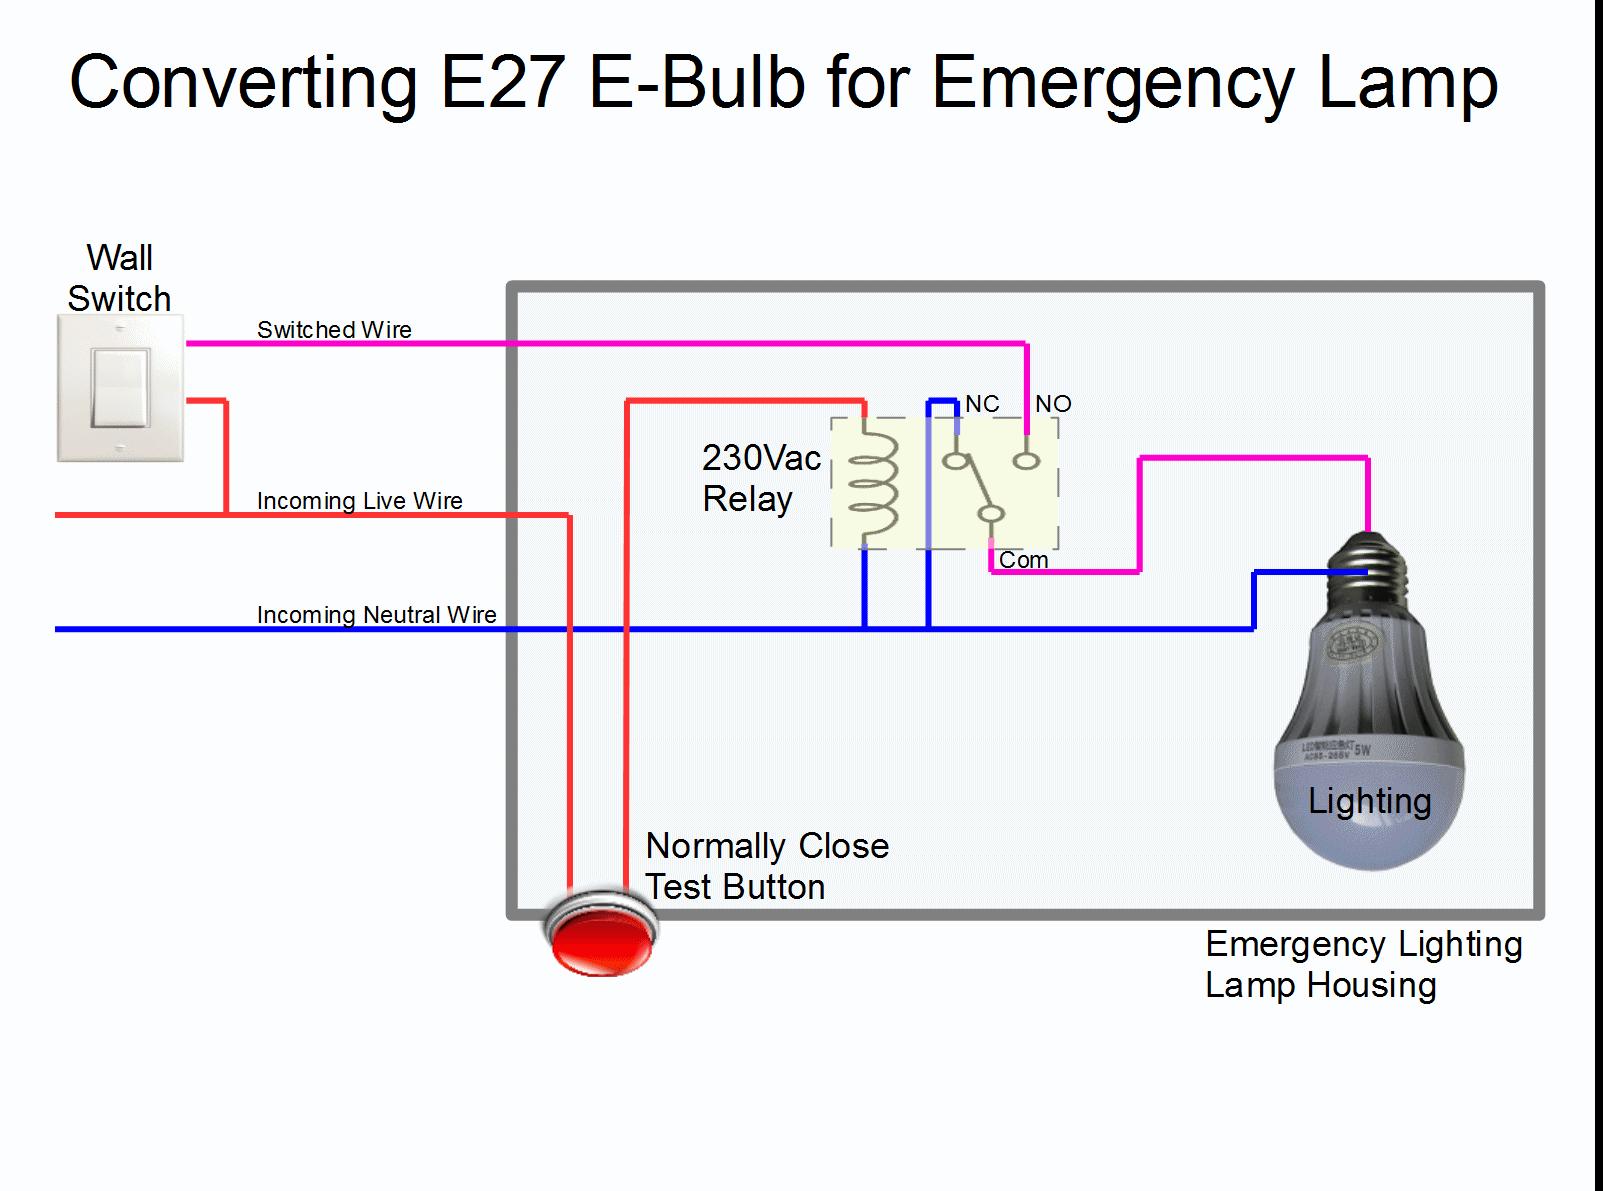 Converting E27 Emergency Bulb to an Emergency Lamp